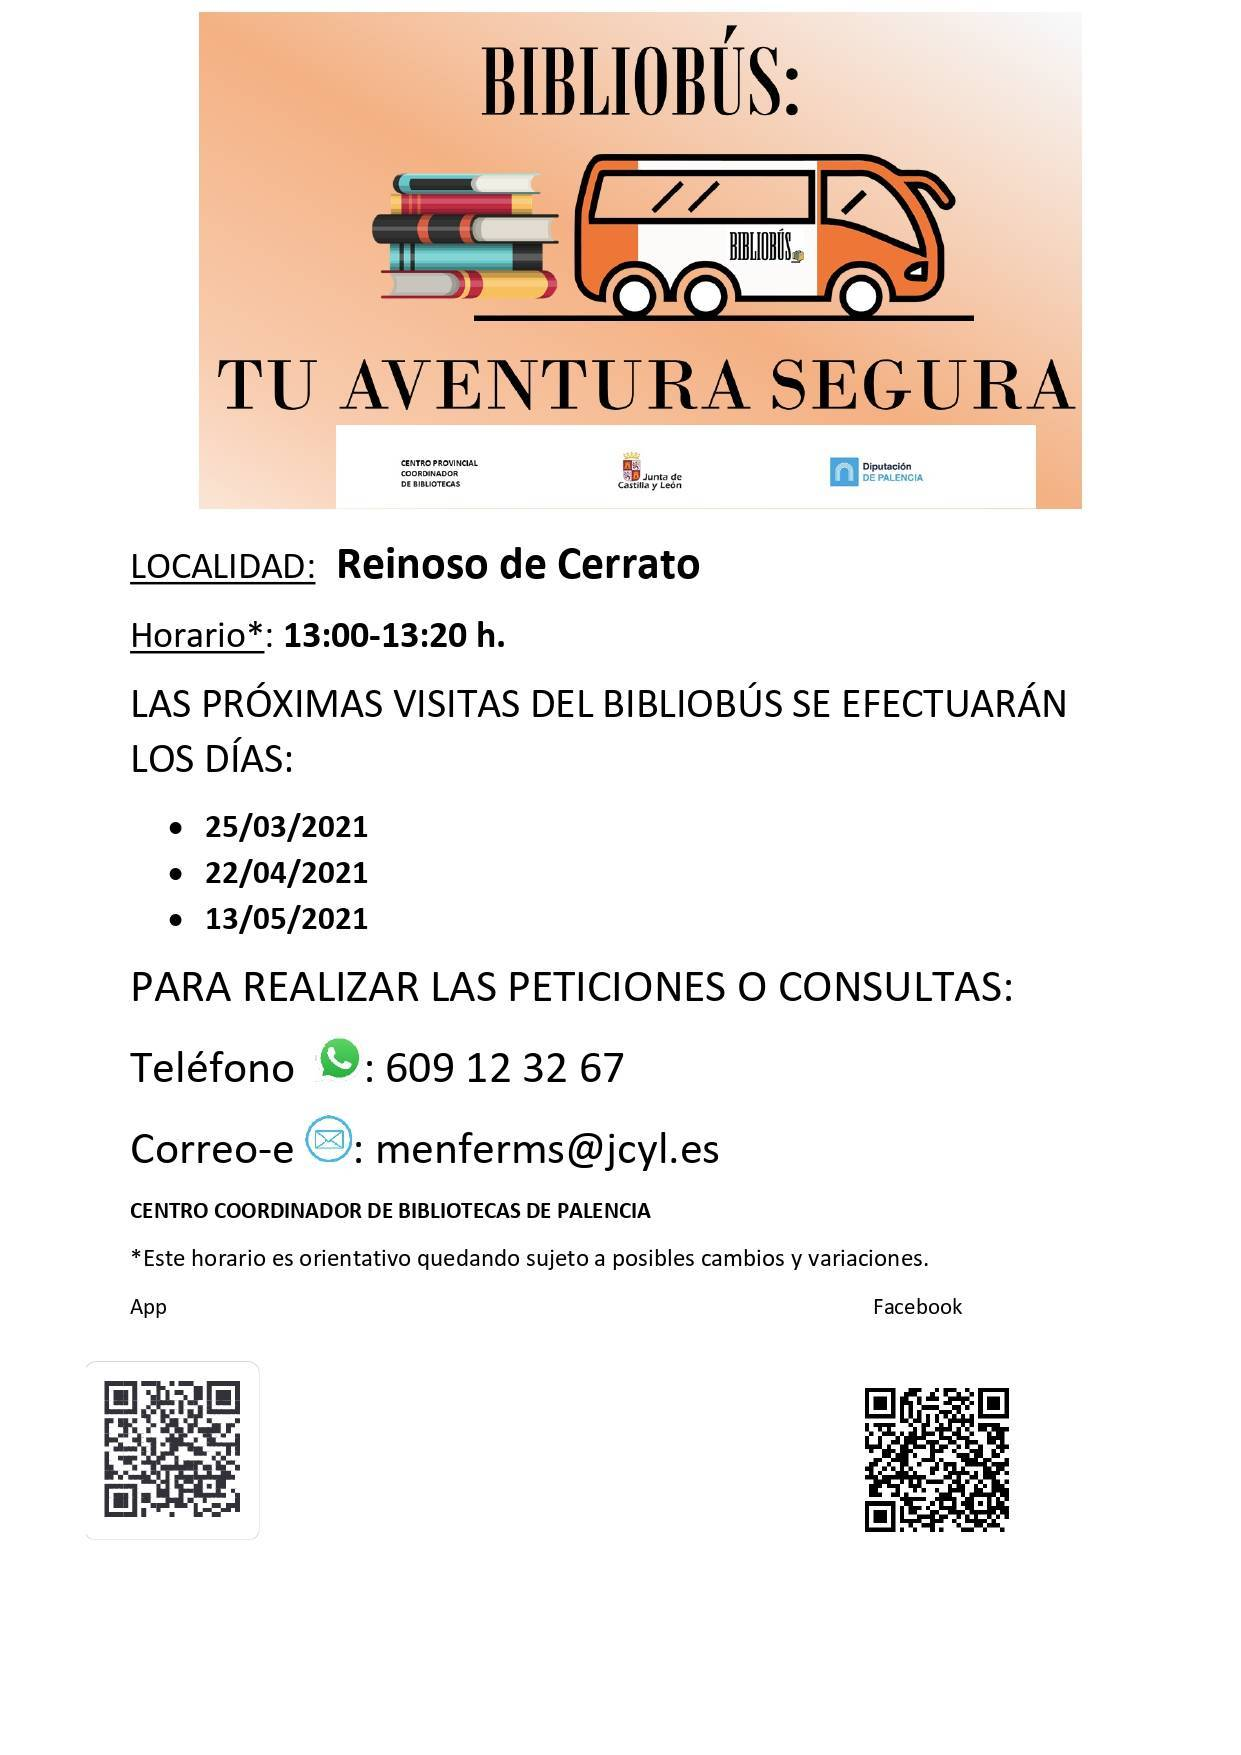 Bibliobús (2021) - Reinoso de Cerrato (Palencia)